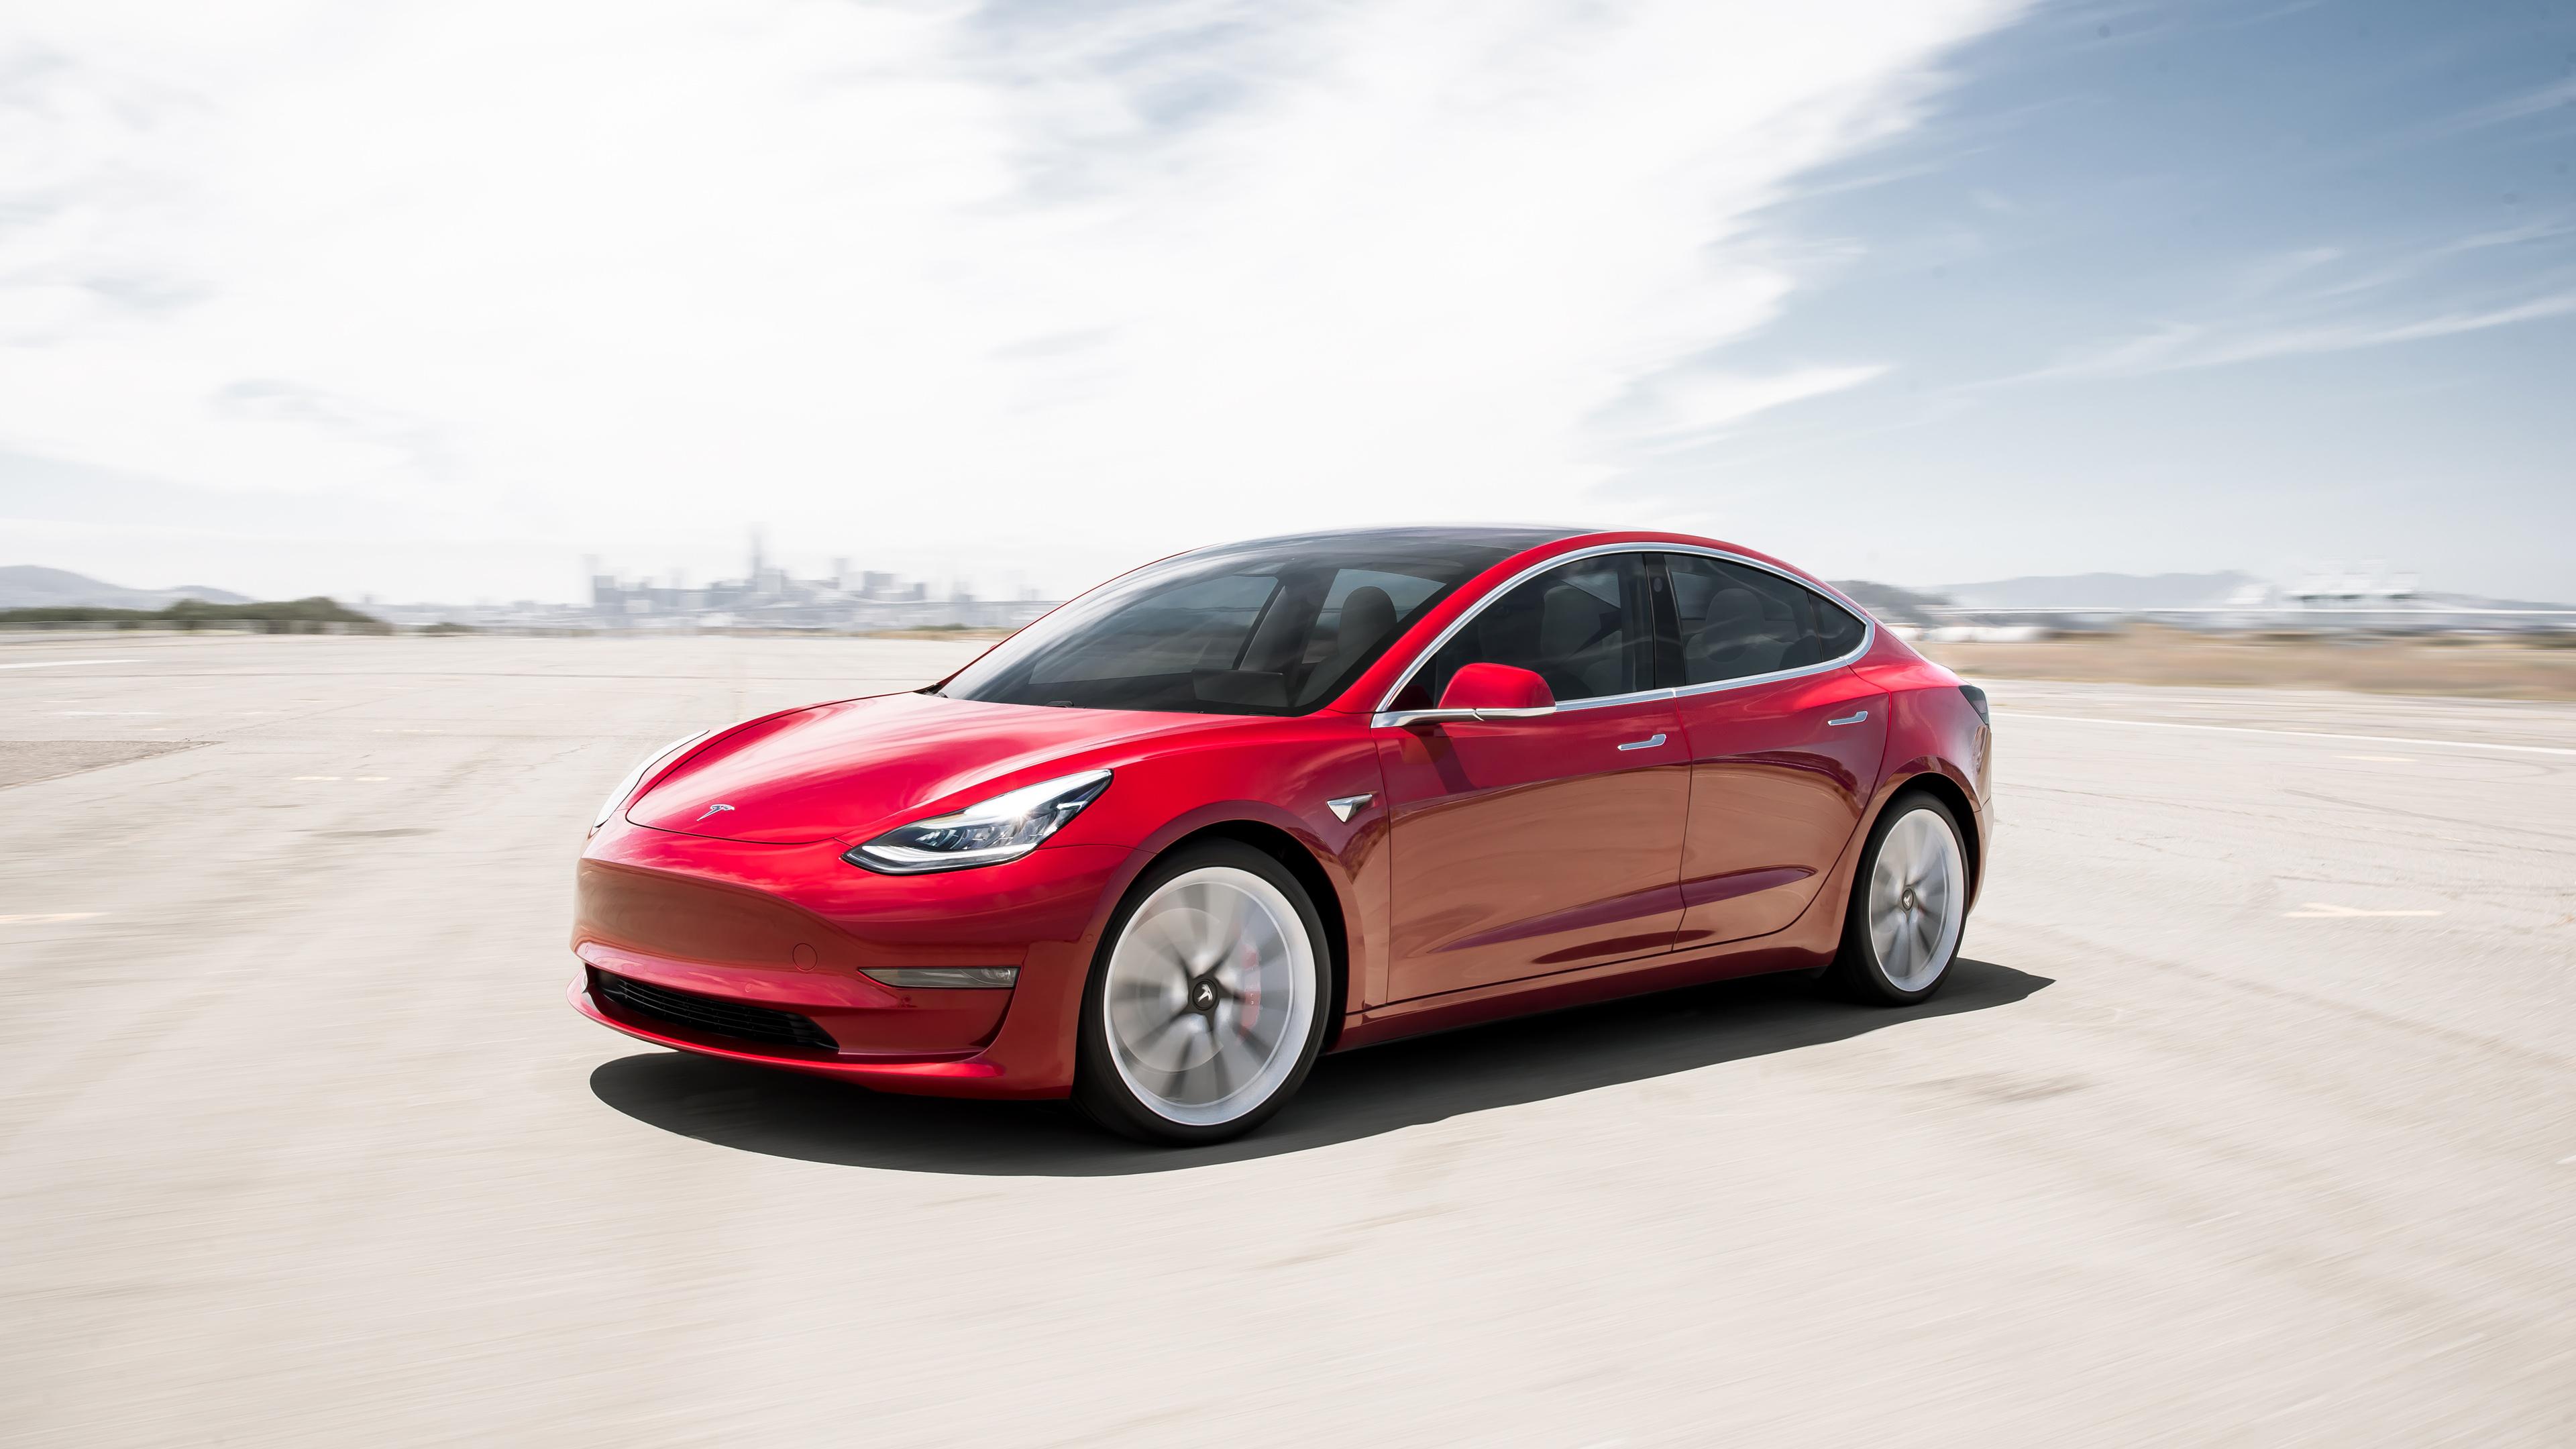 2018 tesla model 3 4k 2 wallpaper hd car wallpapers id 11242 - Tesla wallpaper android ...